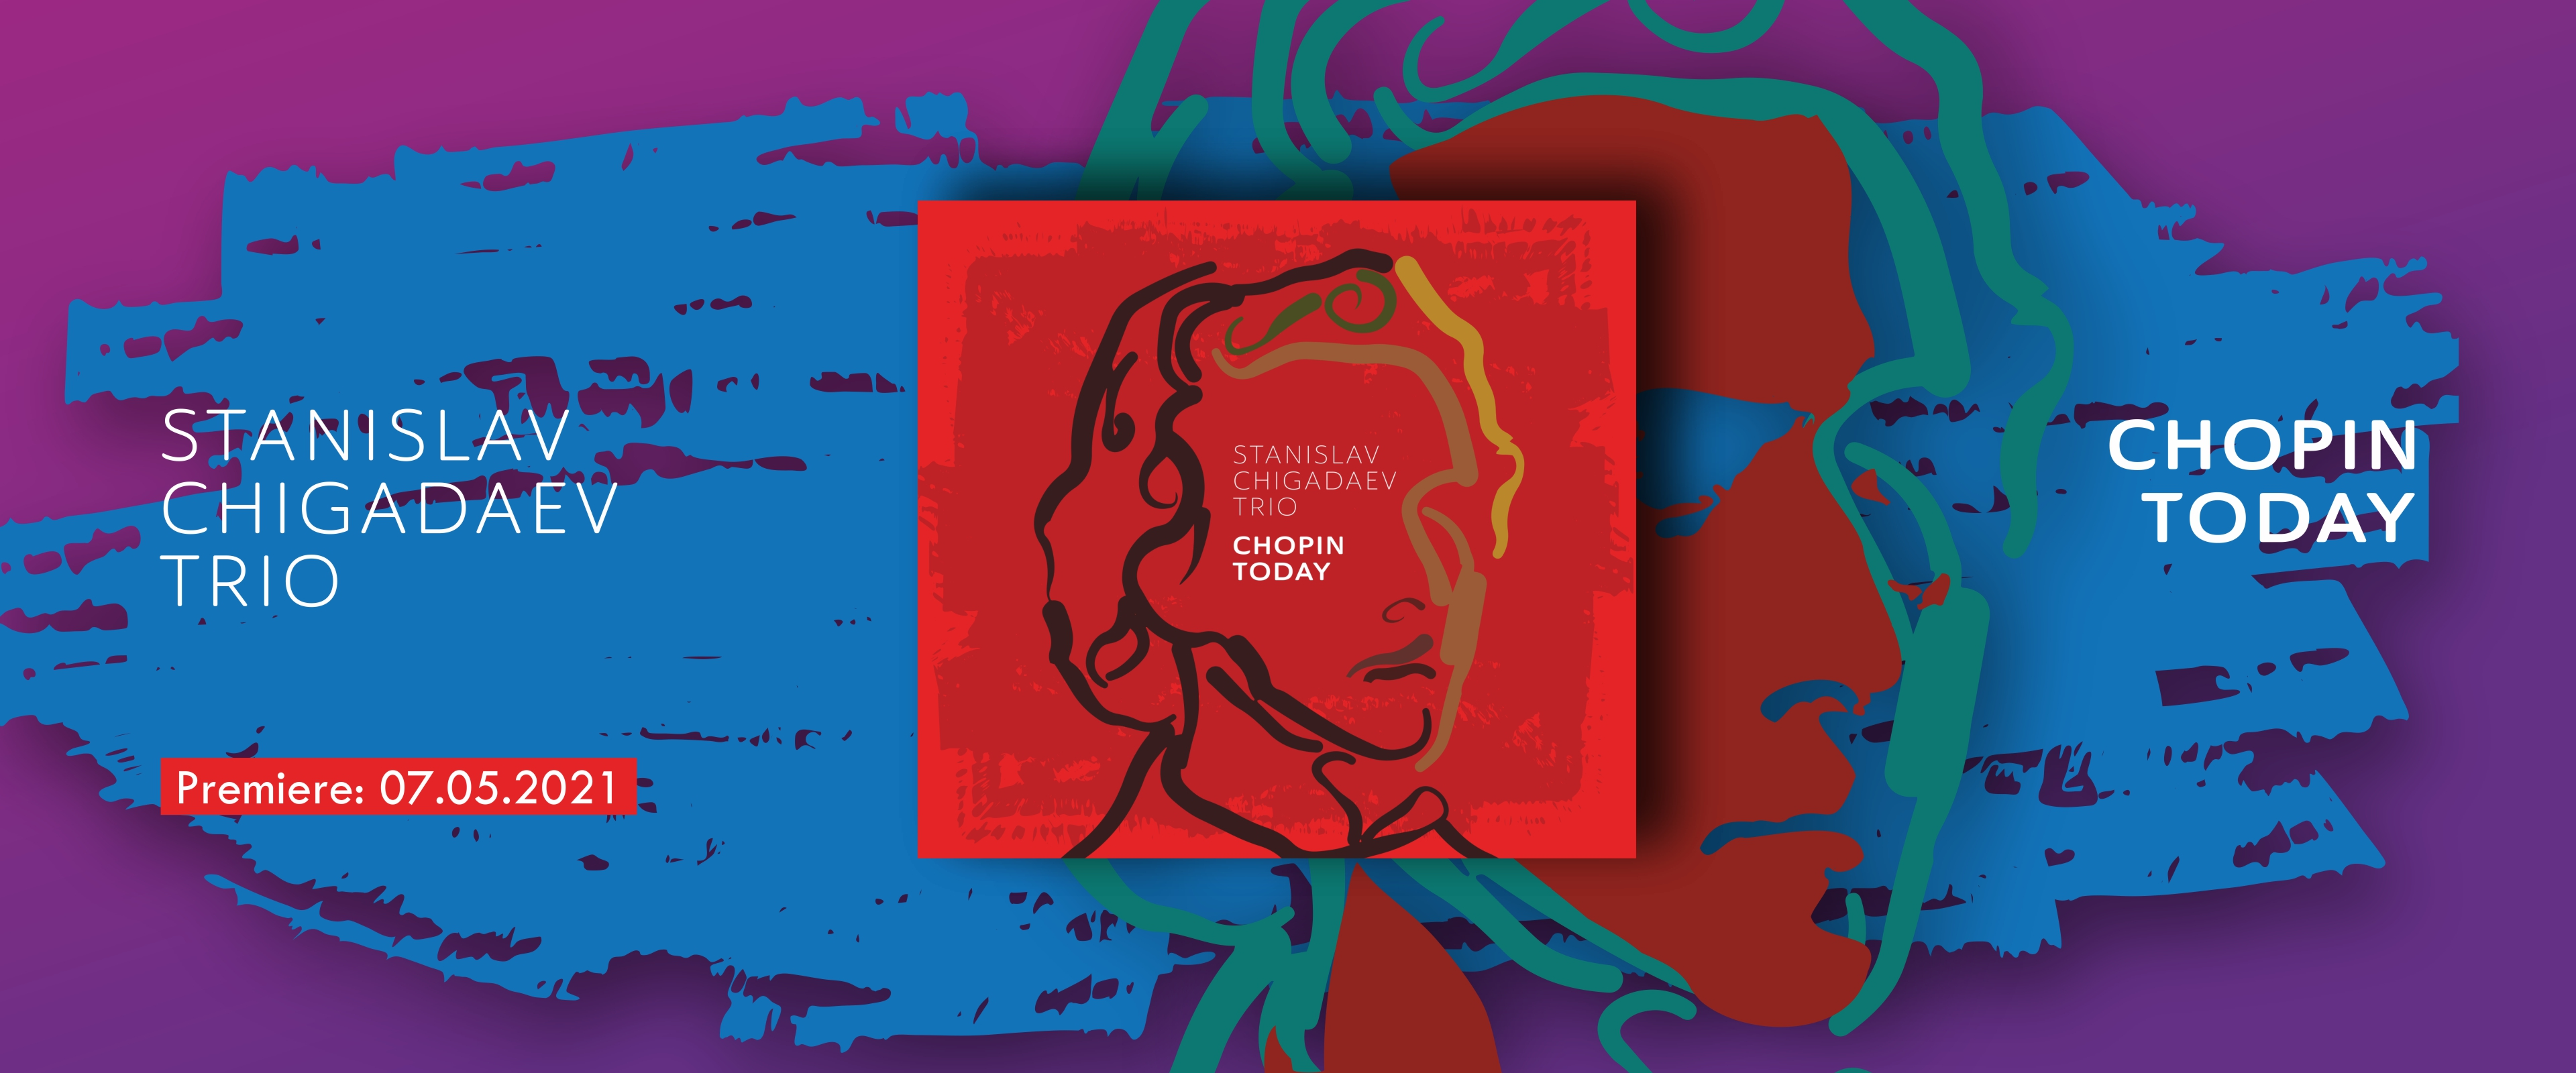 Stanislav Chigadaev Trio - Chopin Today